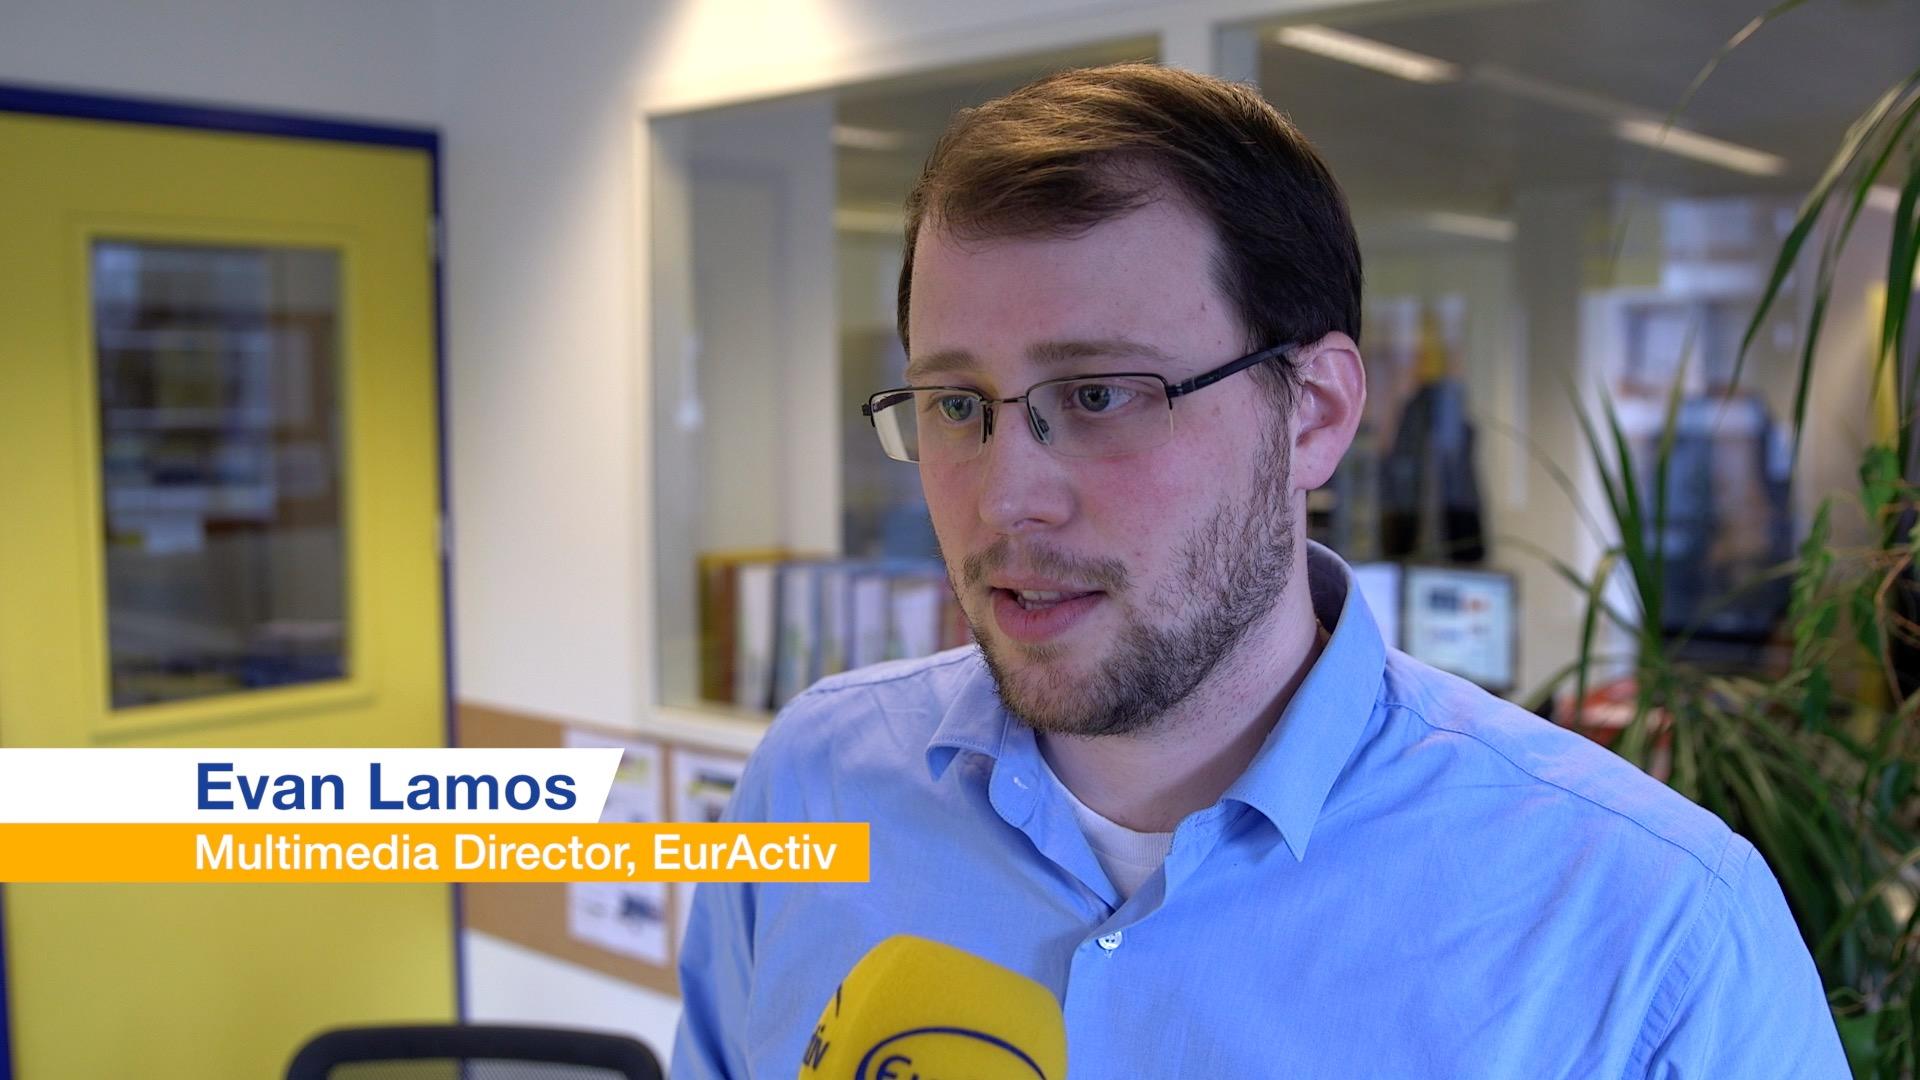 Evan Lamos